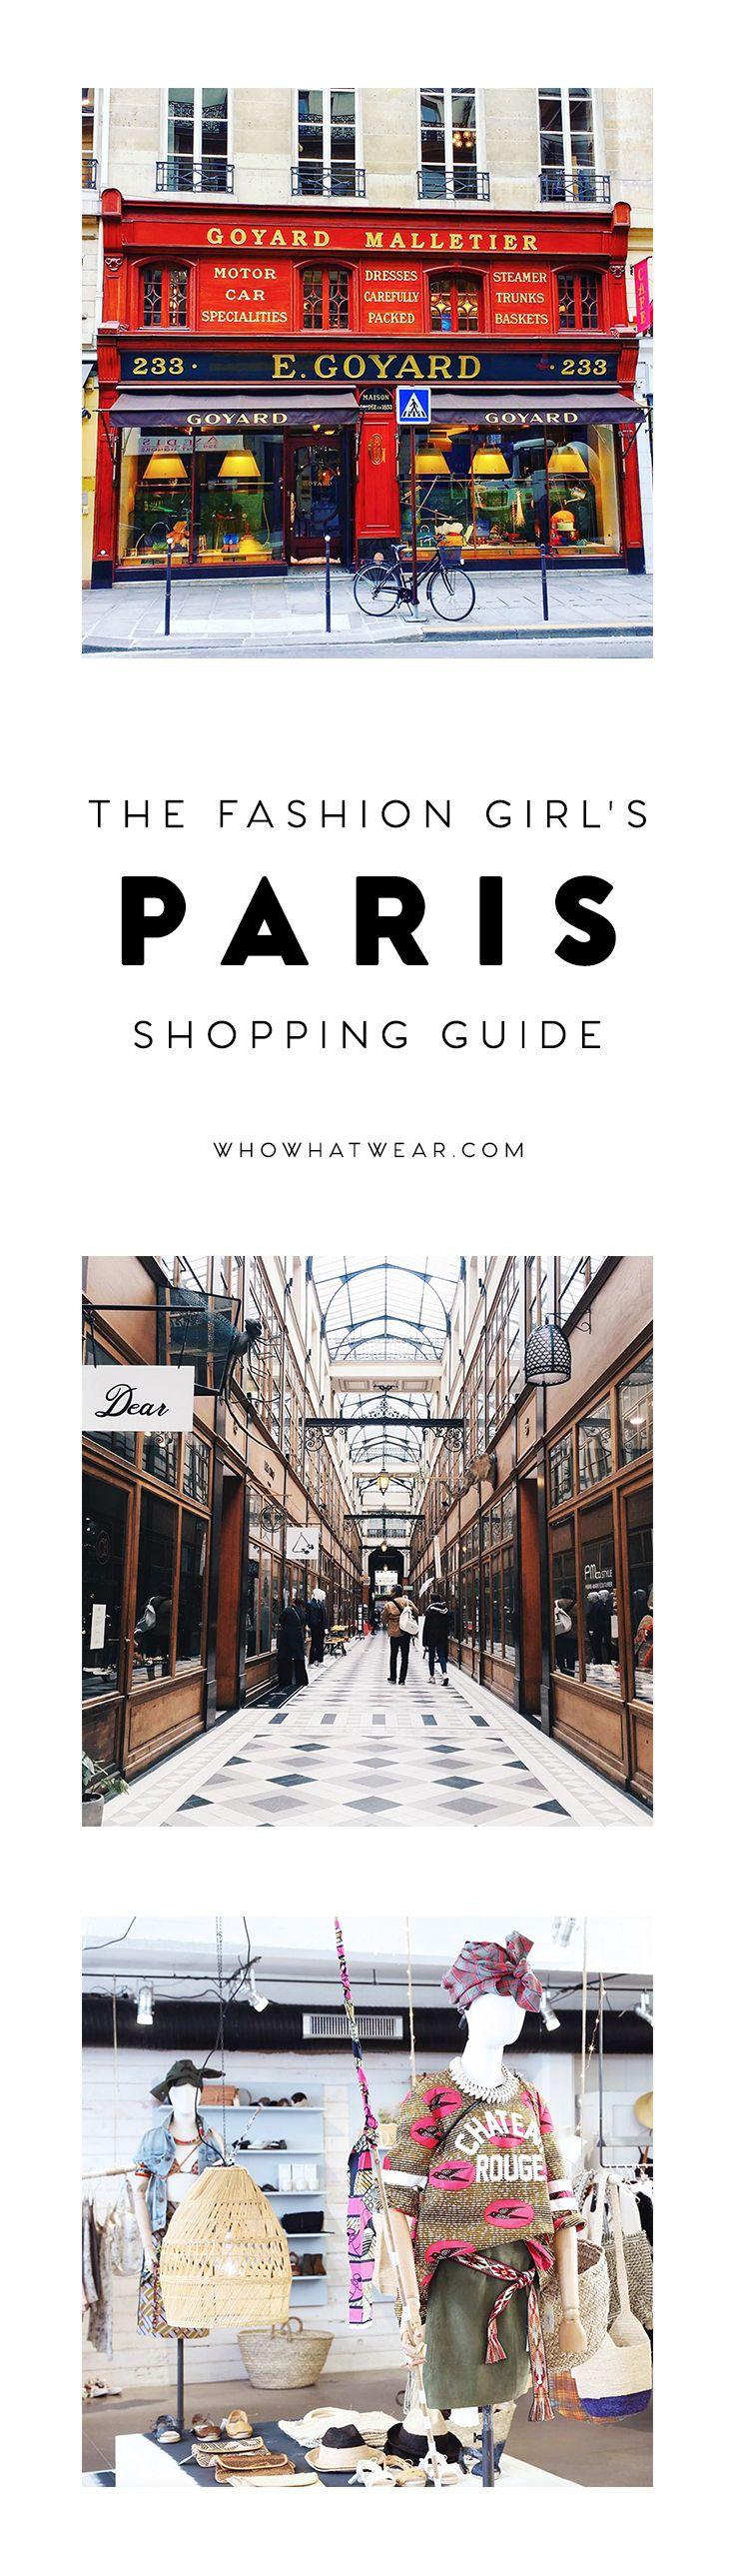 The fashion girl's shopping guide to Paris